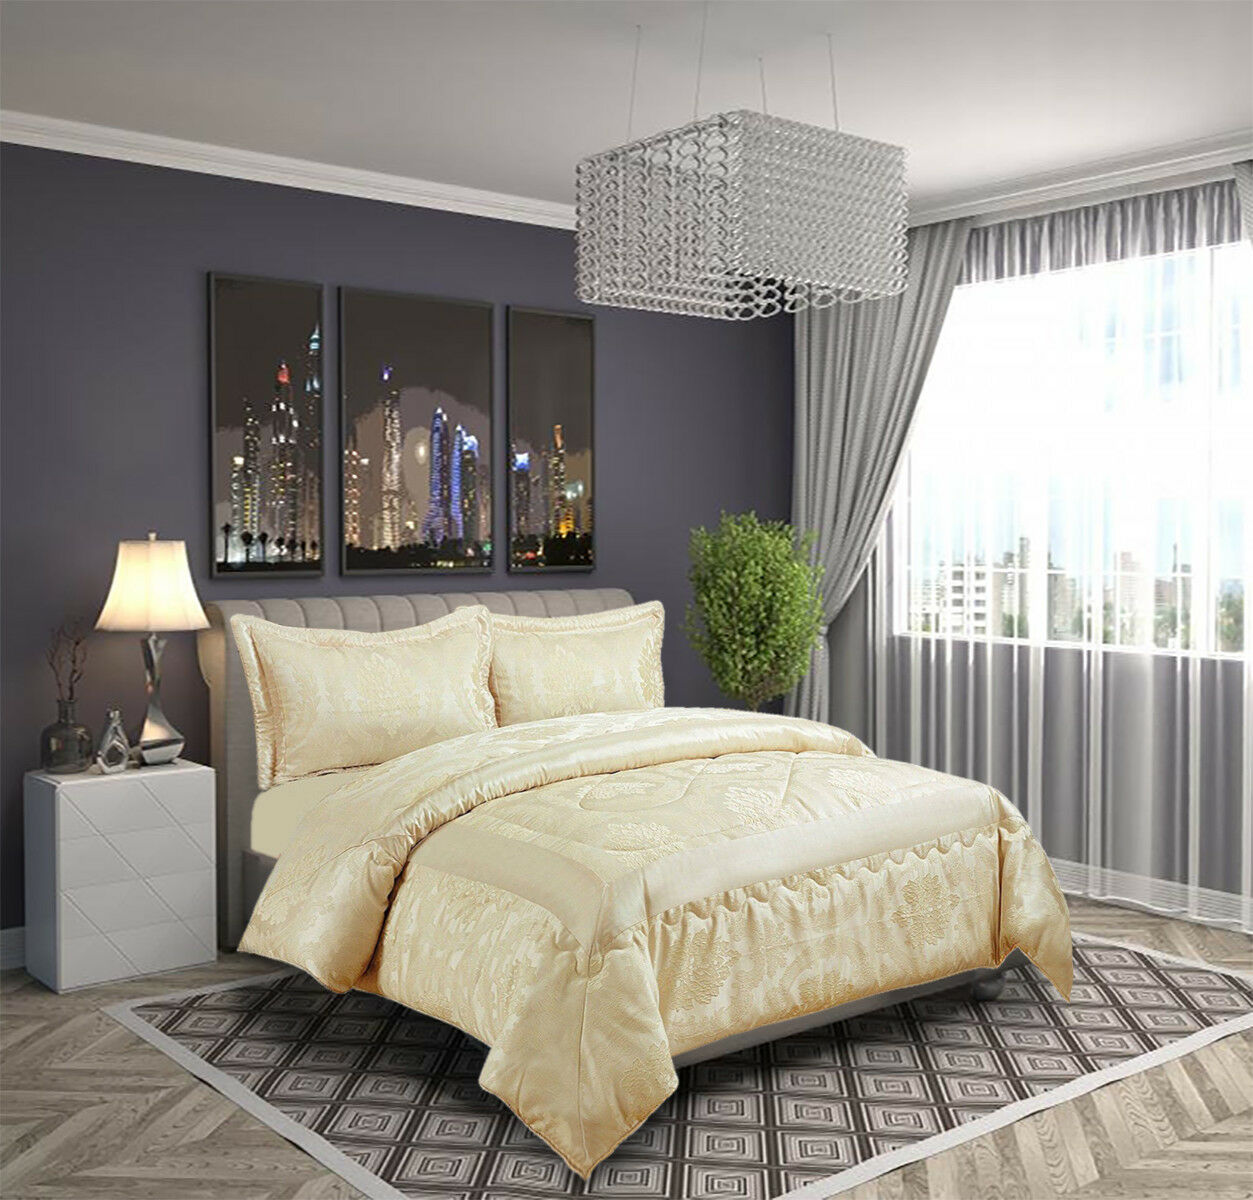 jacquard bett berwurf gesteppte tagesdecke 220x240 240x260. Black Bedroom Furniture Sets. Home Design Ideas